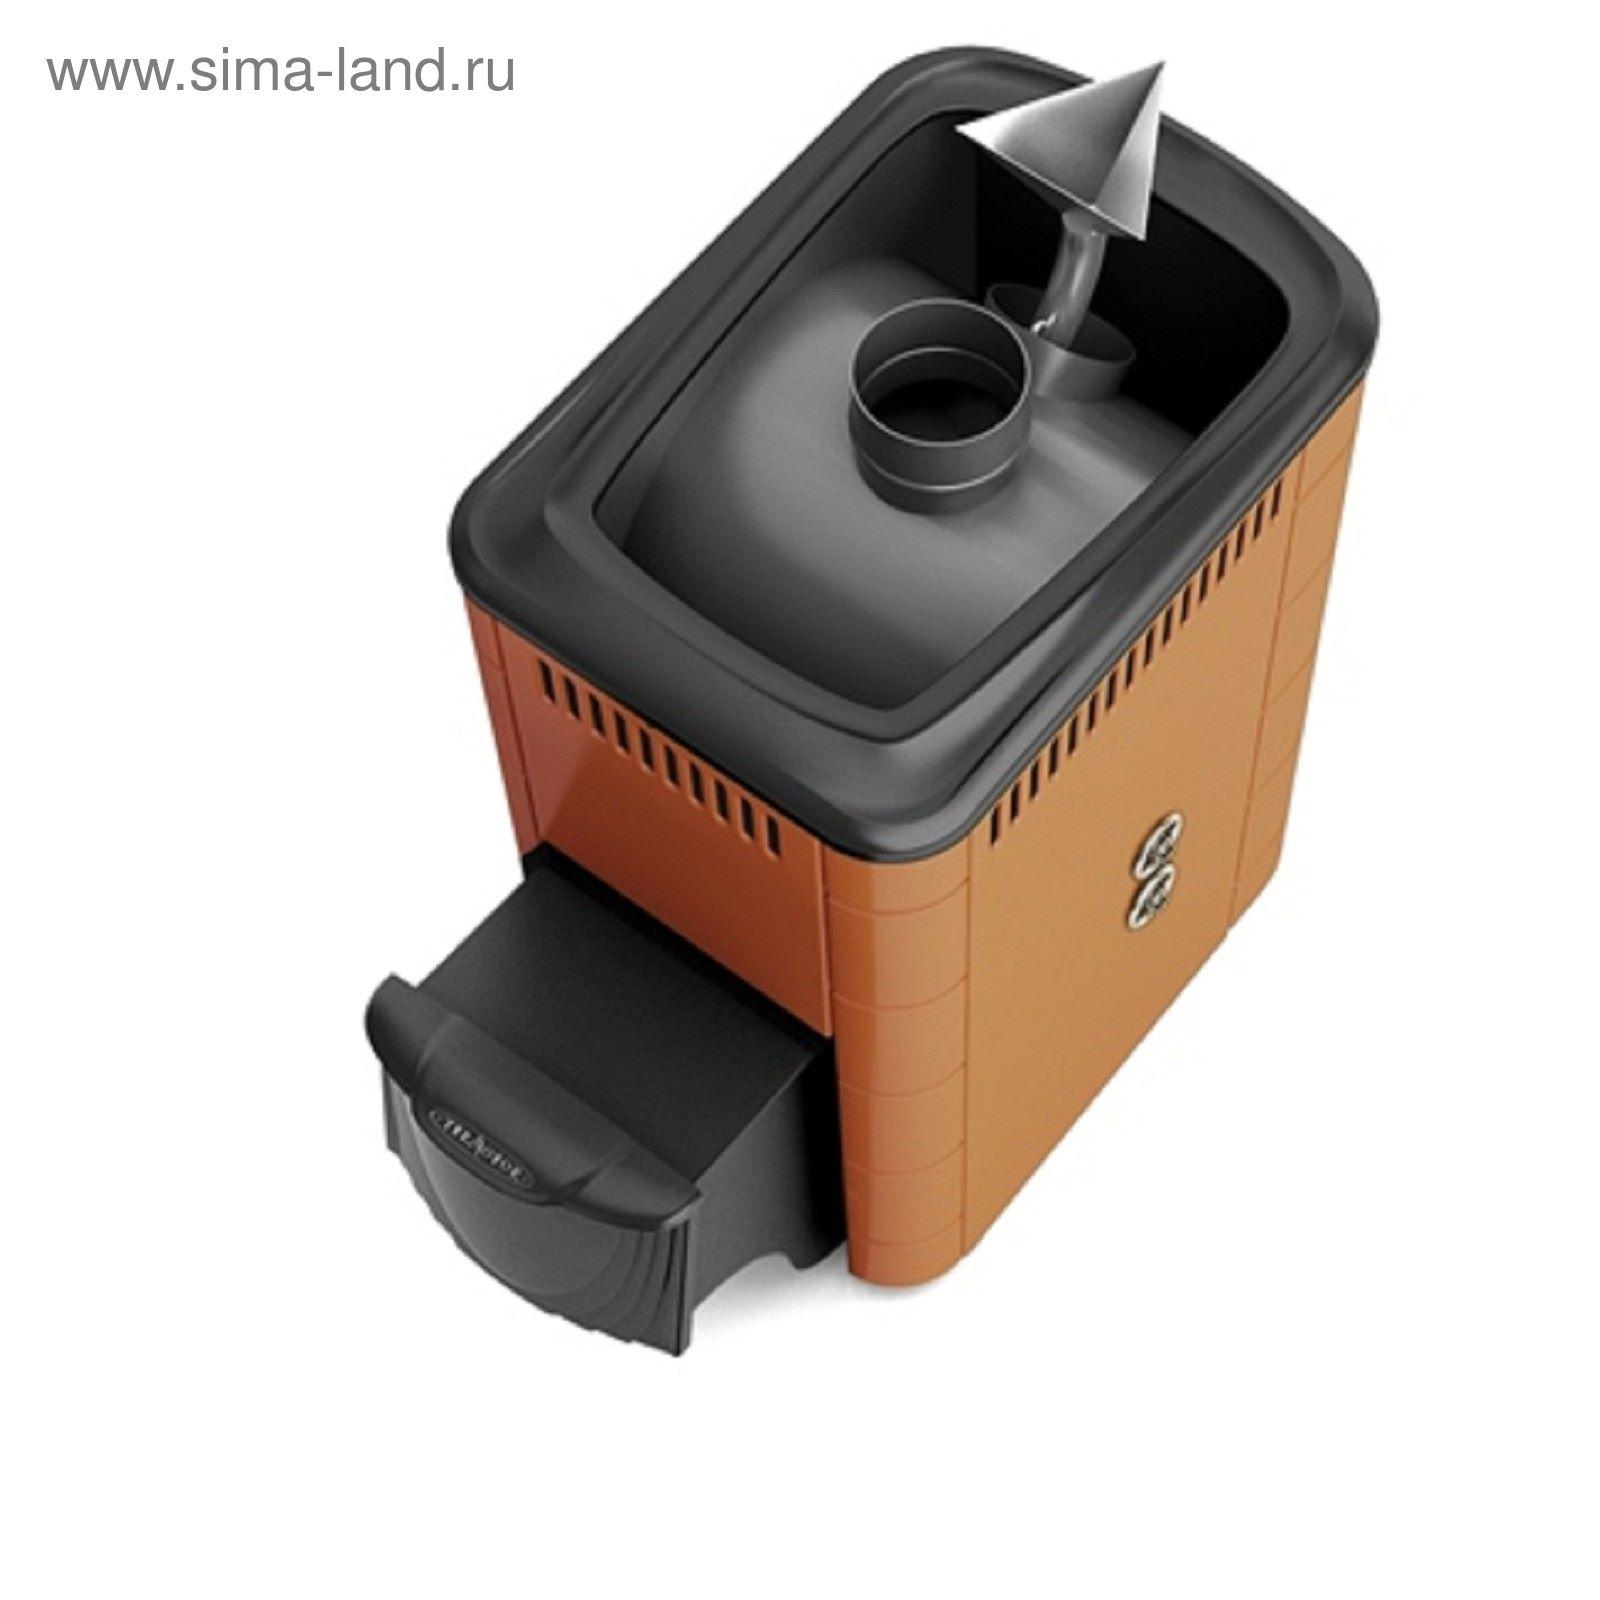 Уплотнения теплообменника Alfa Laval AQ14L-FM Нижний Тагил